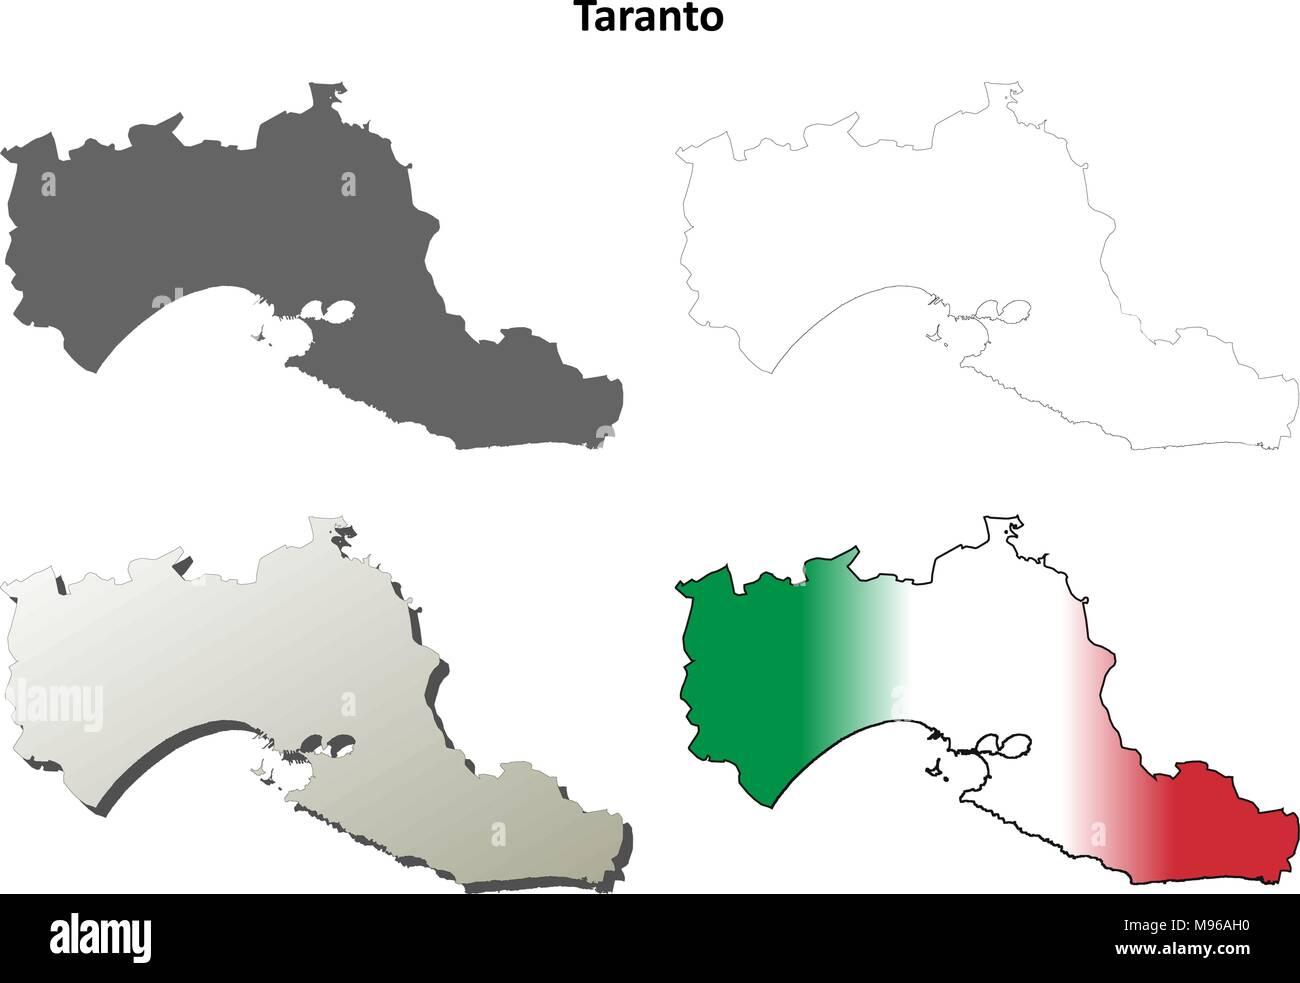 Taranto Map Stock Photos Taranto Map Stock Images Alamy